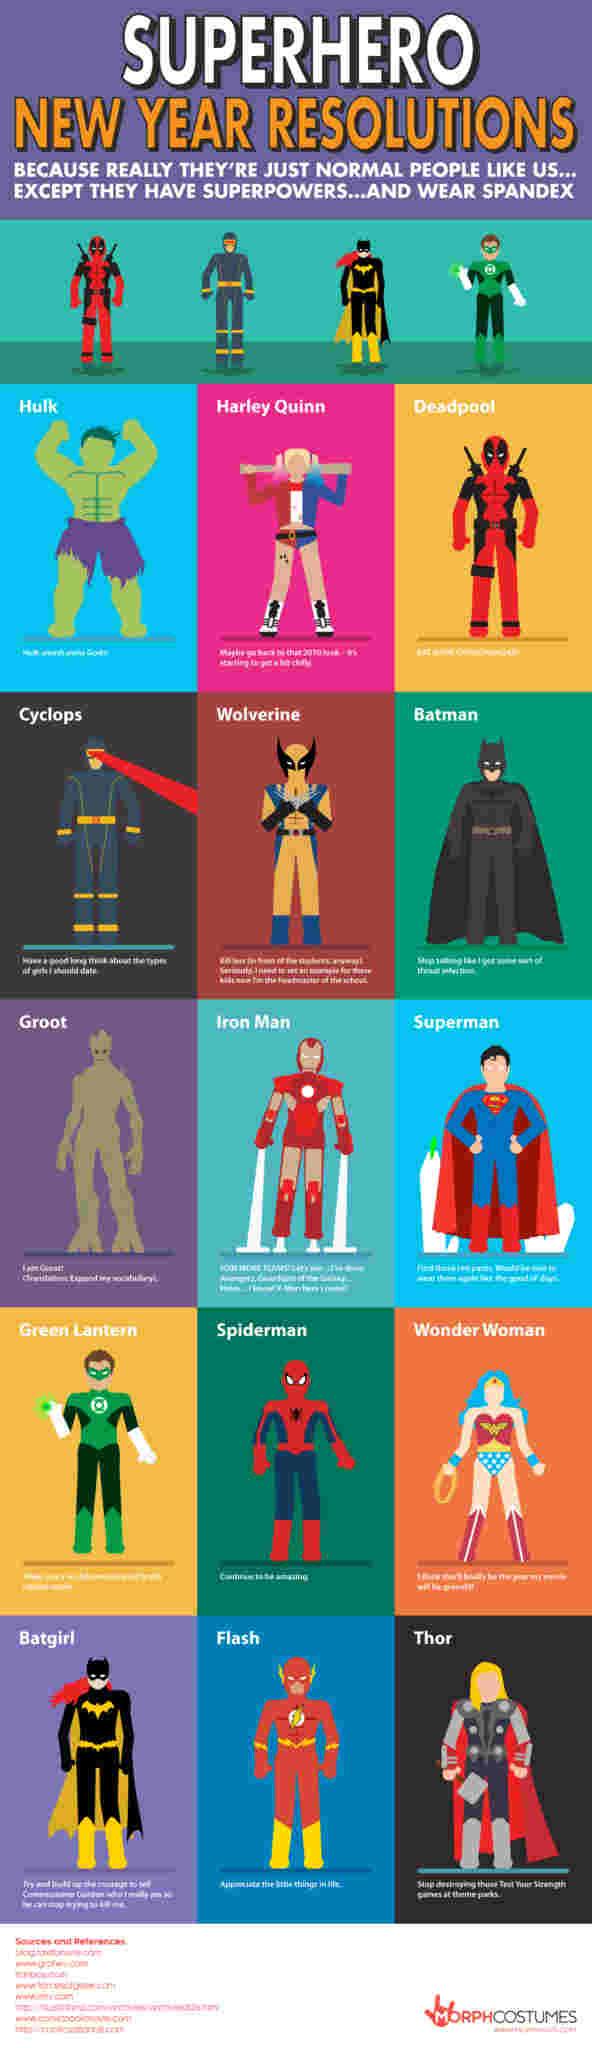 Superhero-New-Year-Resolutions-IG1